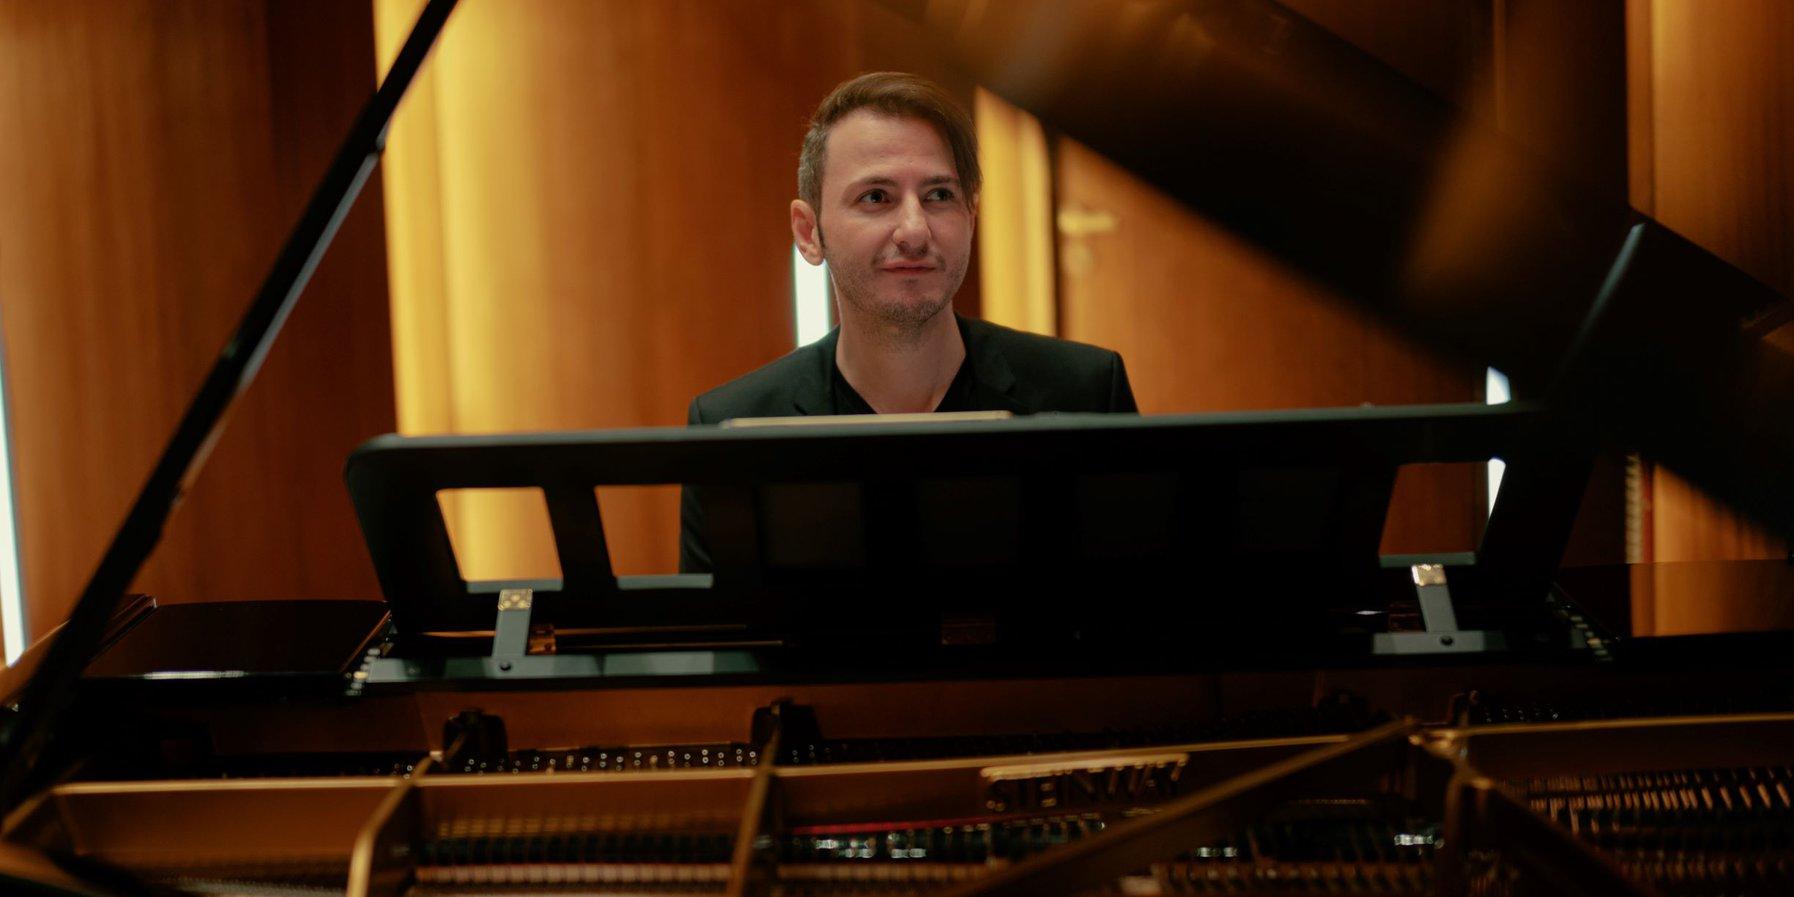 Michail Lifits at the piano